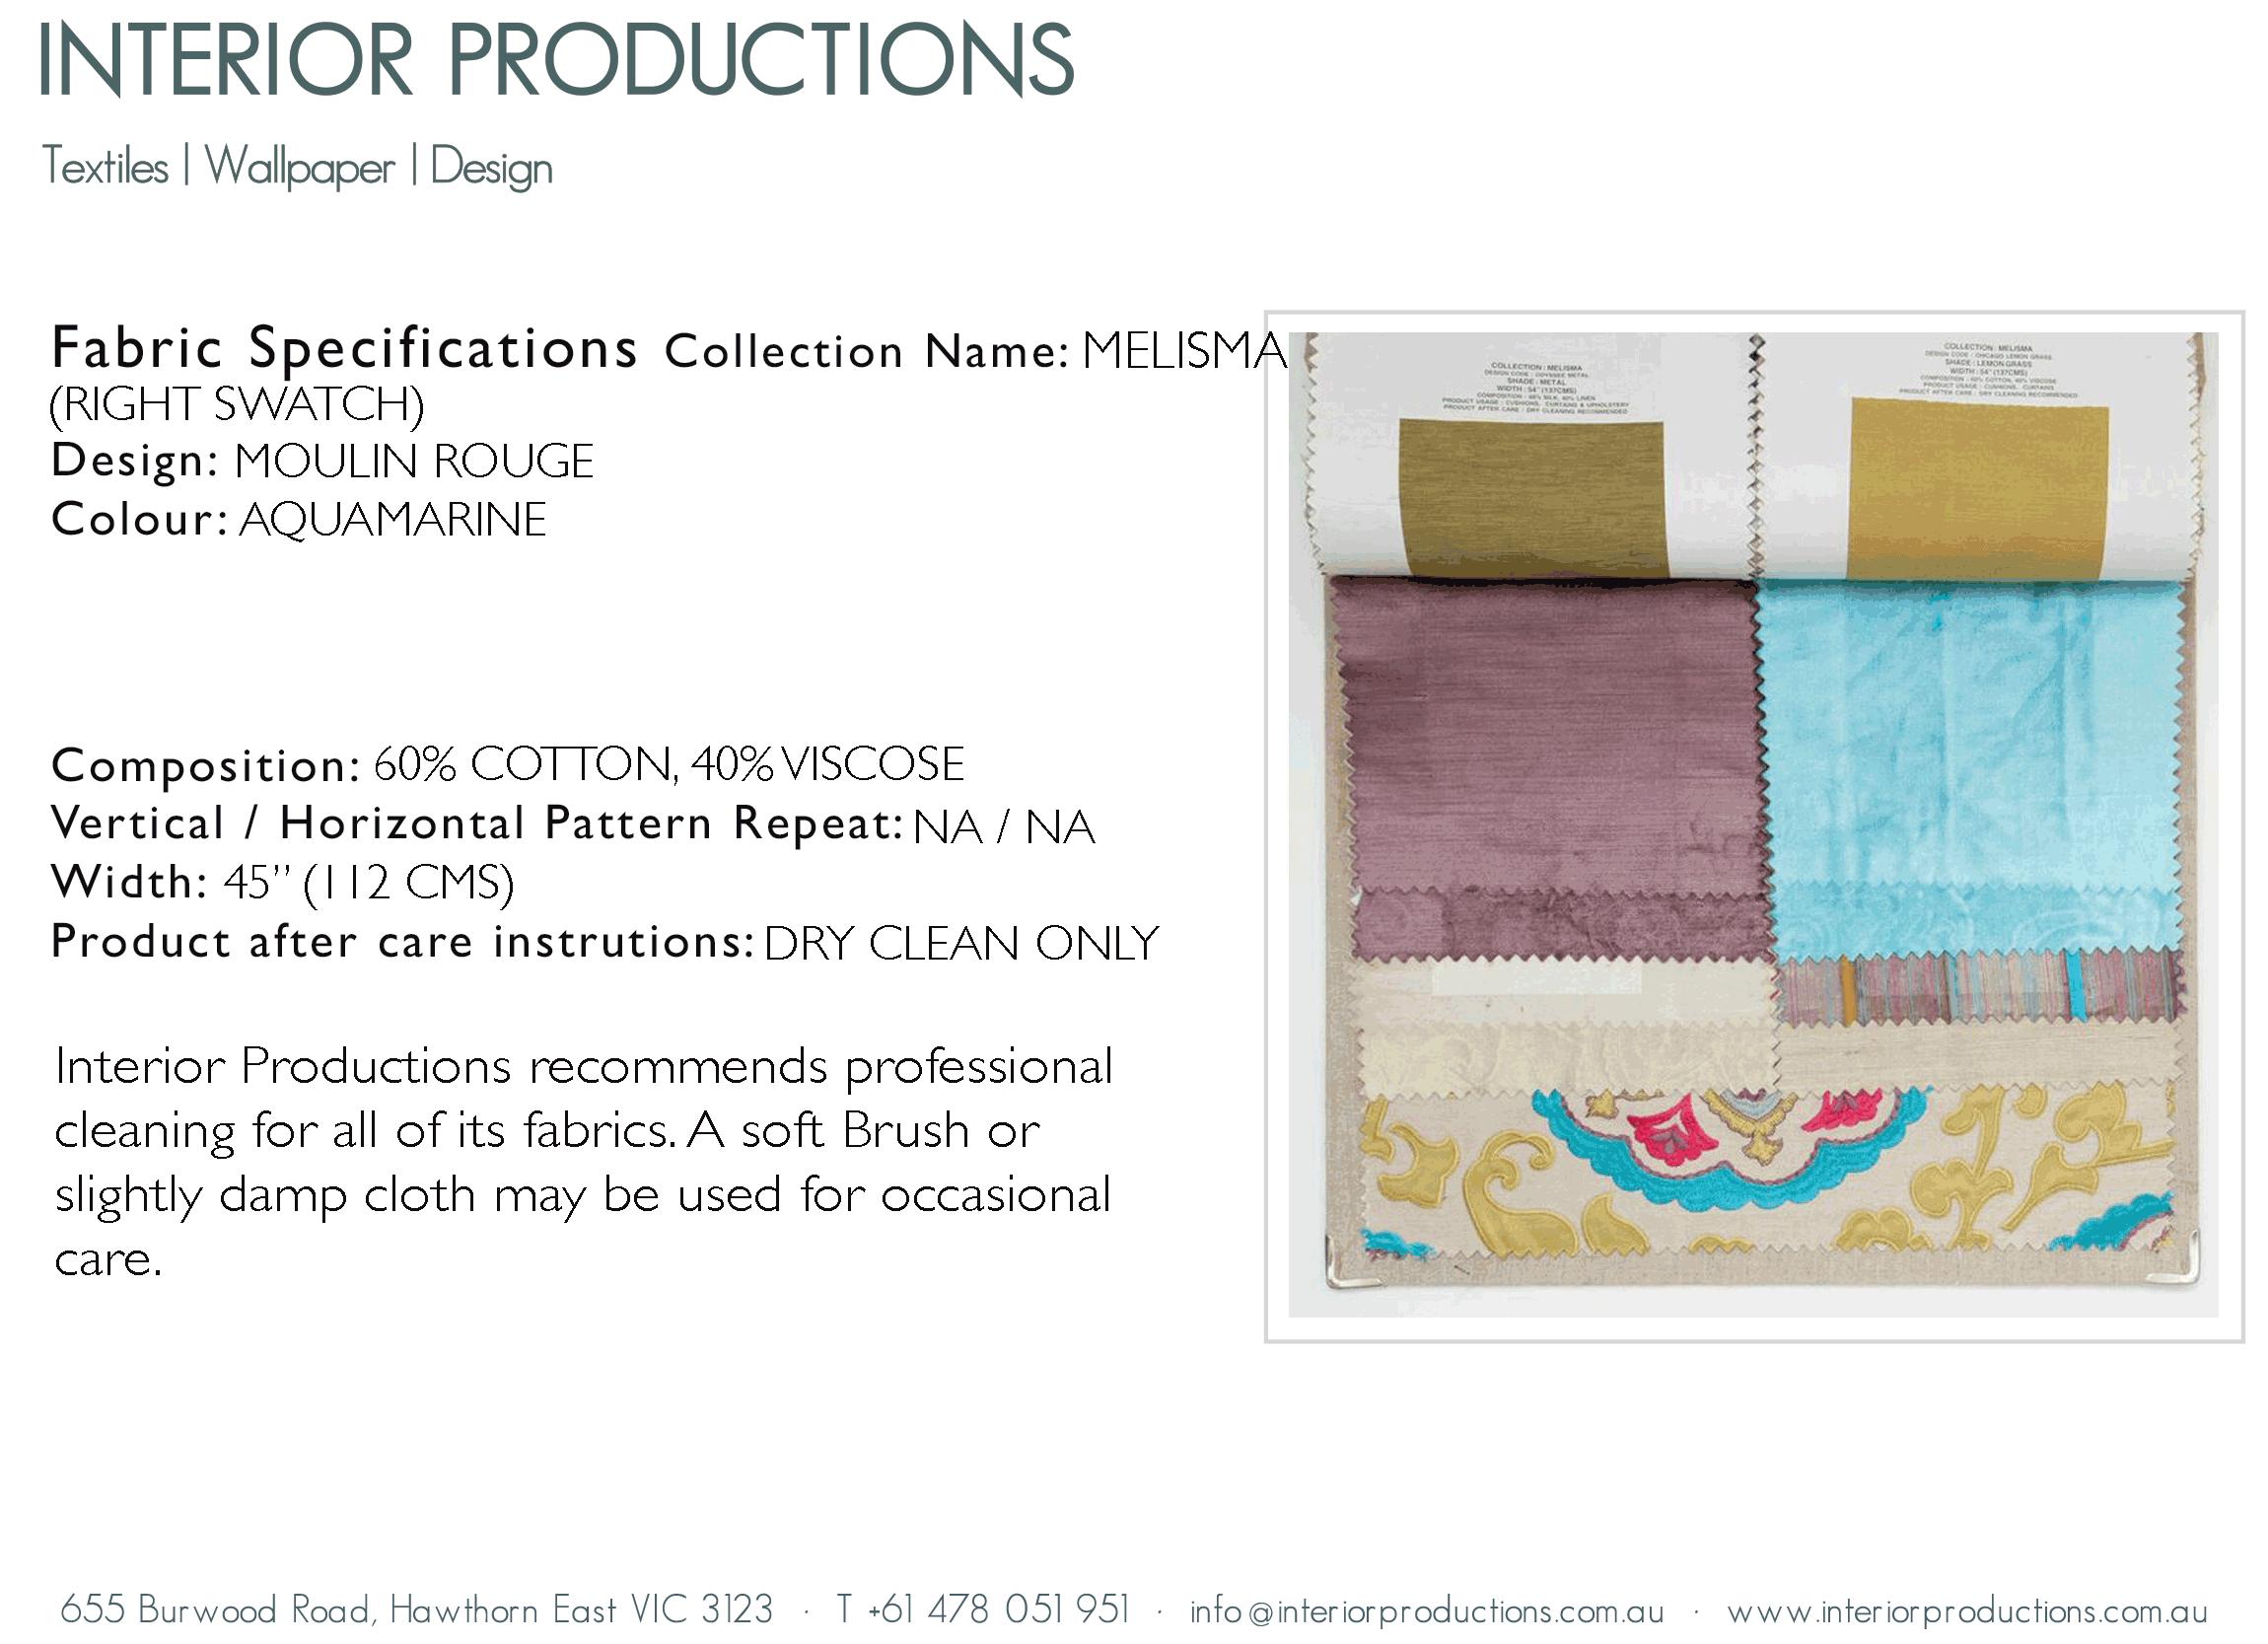 interior_productions_MOULIN-ROUGE---AQUAMARINE